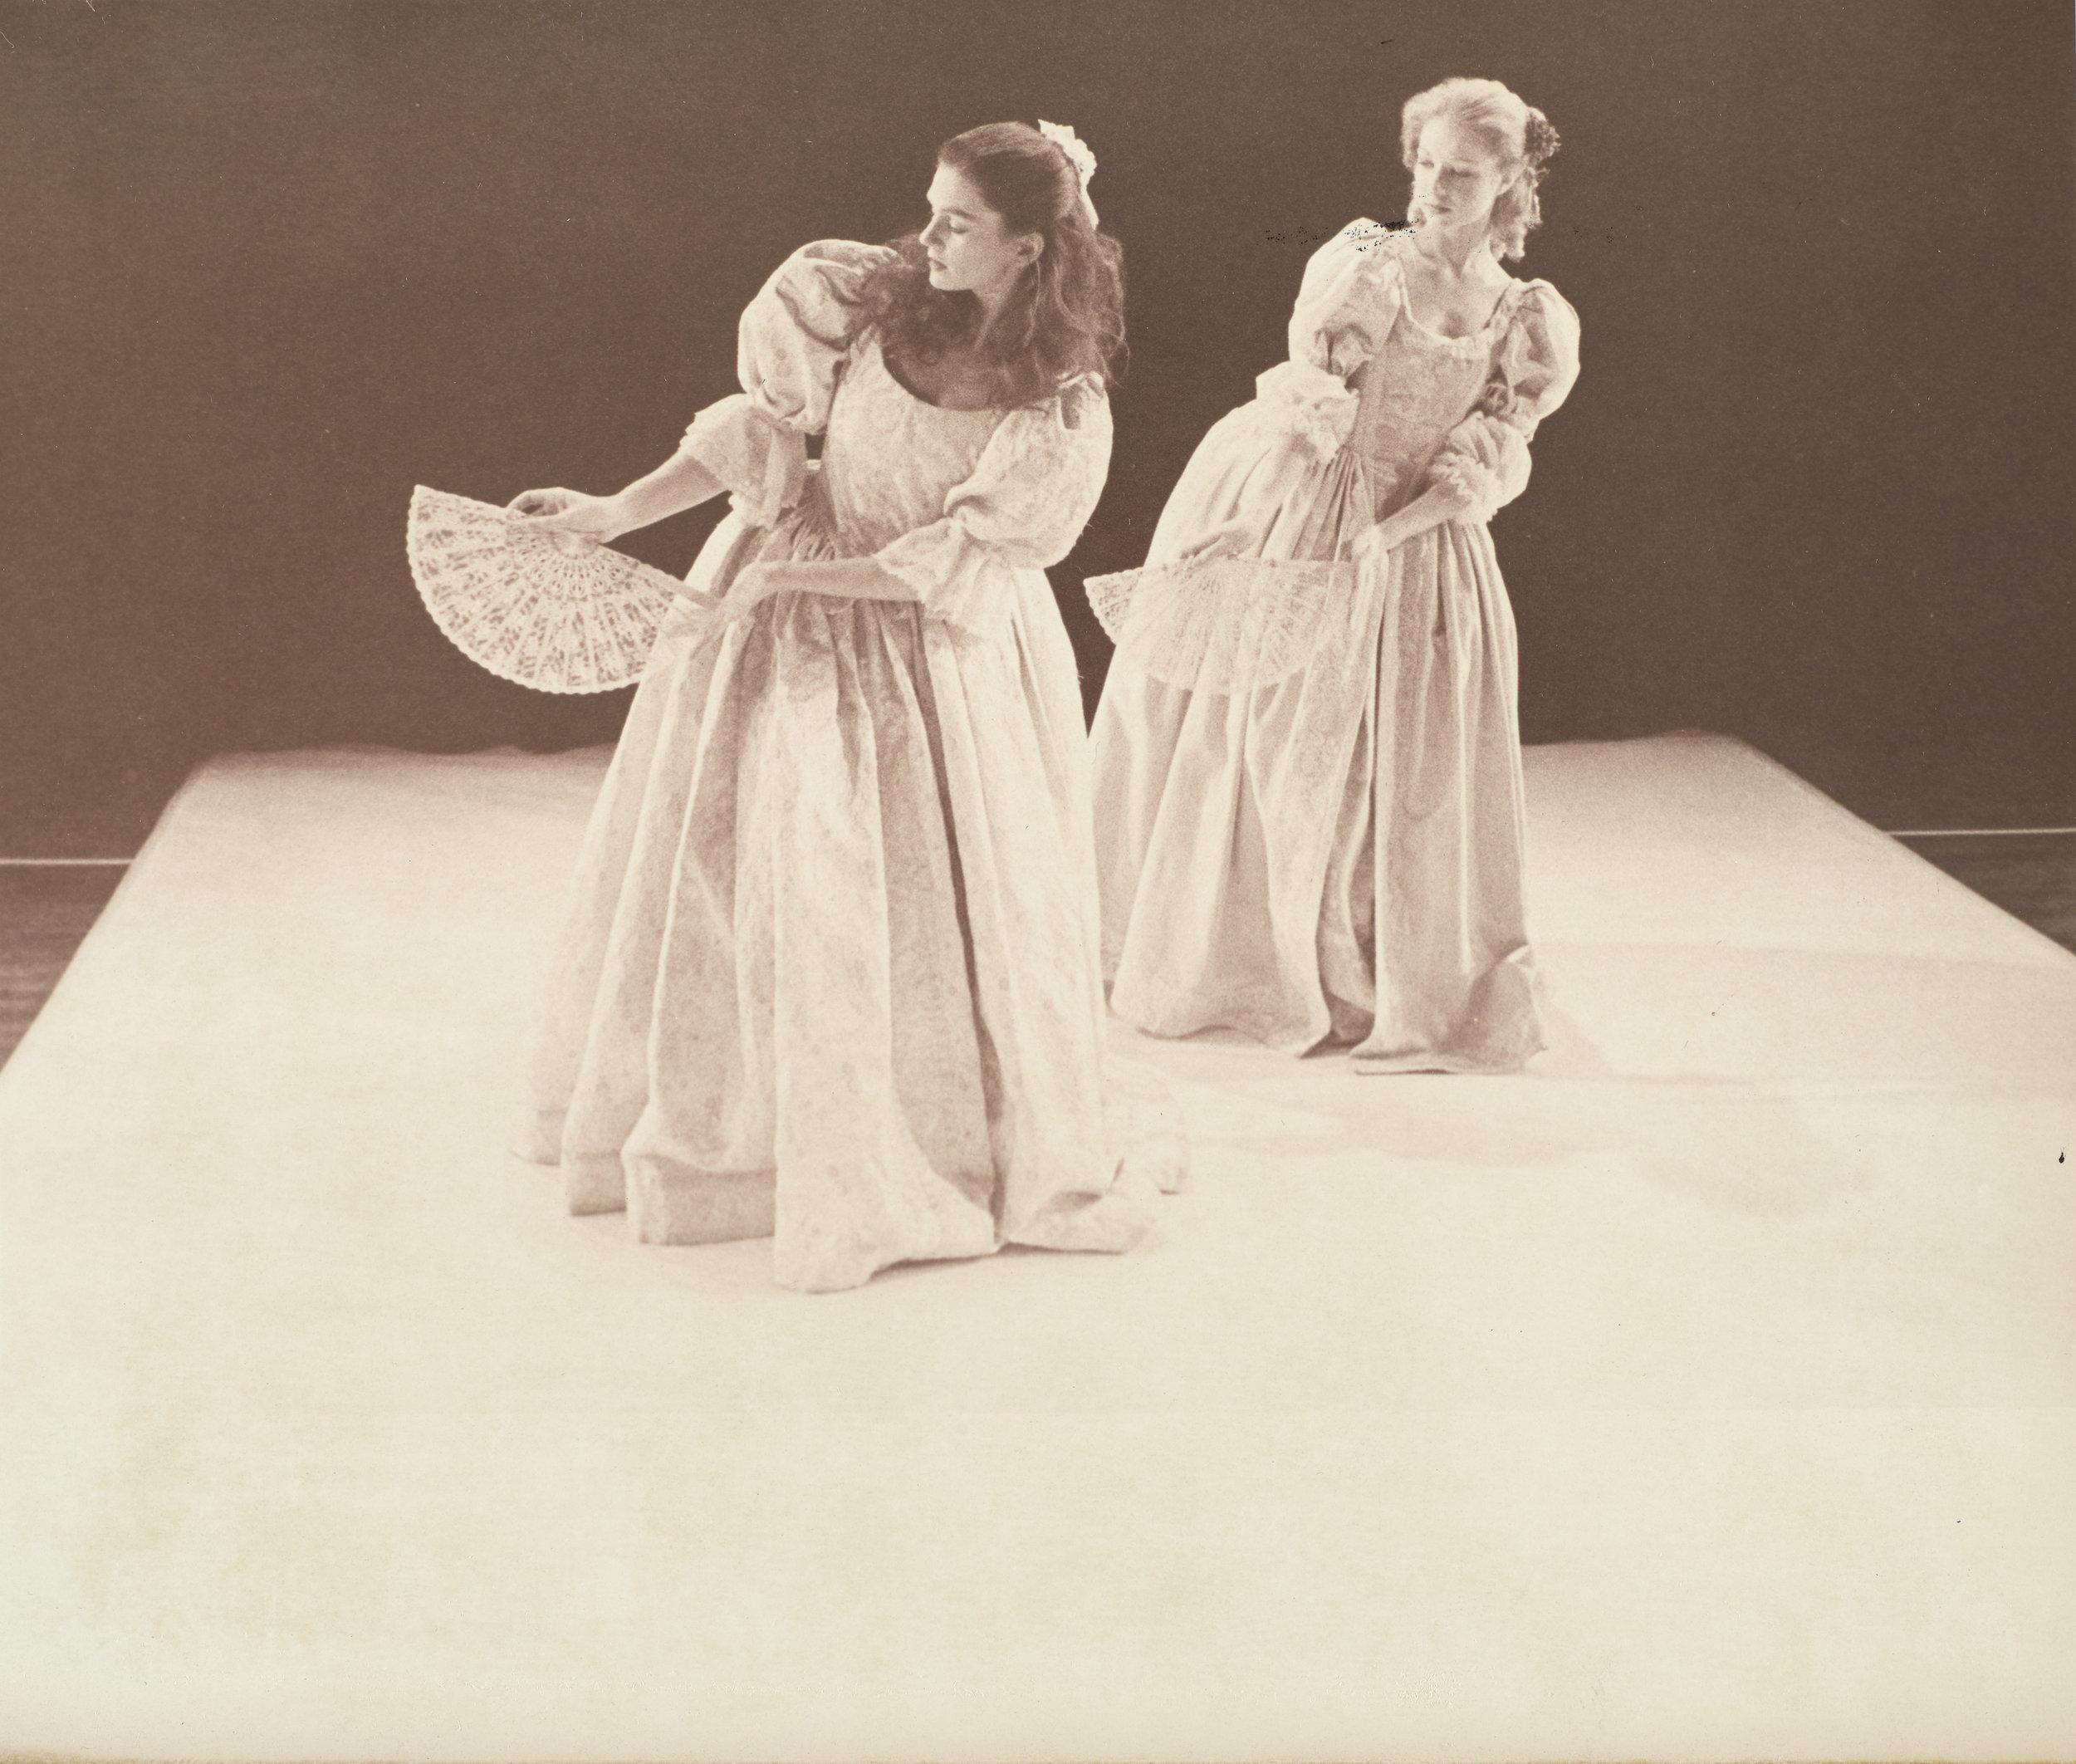 DANCE-DEPARTMENT-11-1-003.jpg